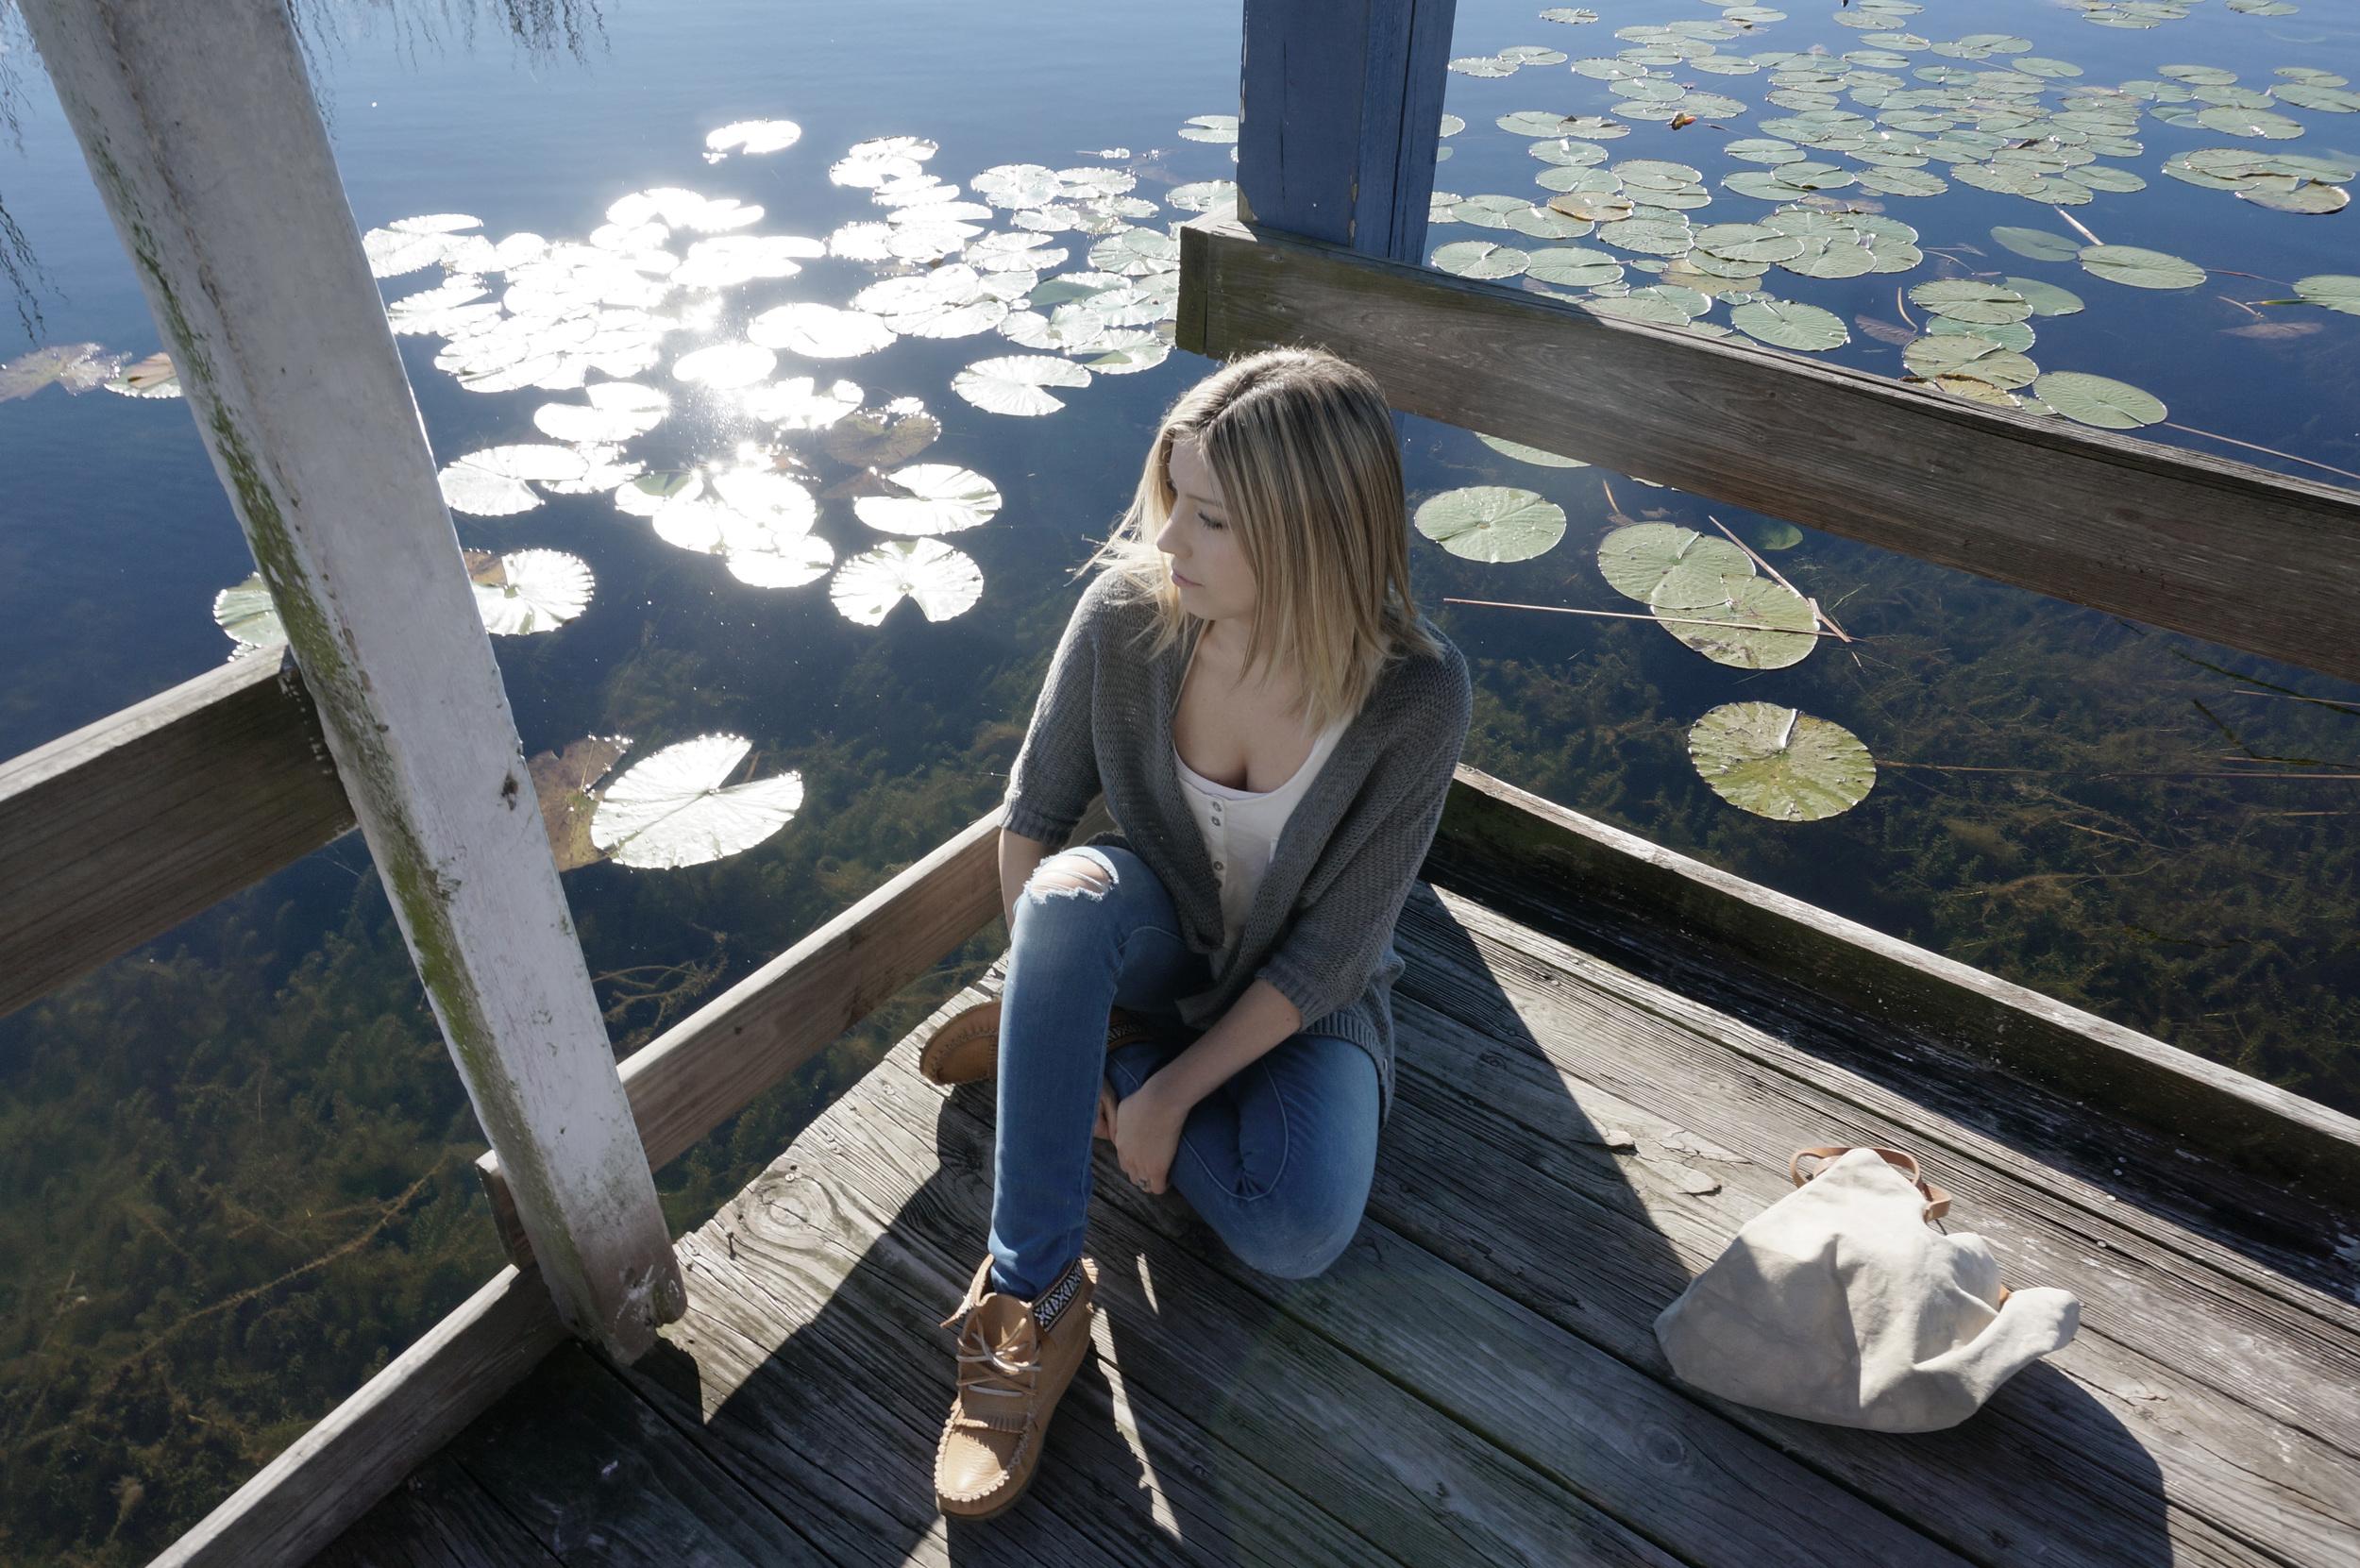 Pond reflection photo